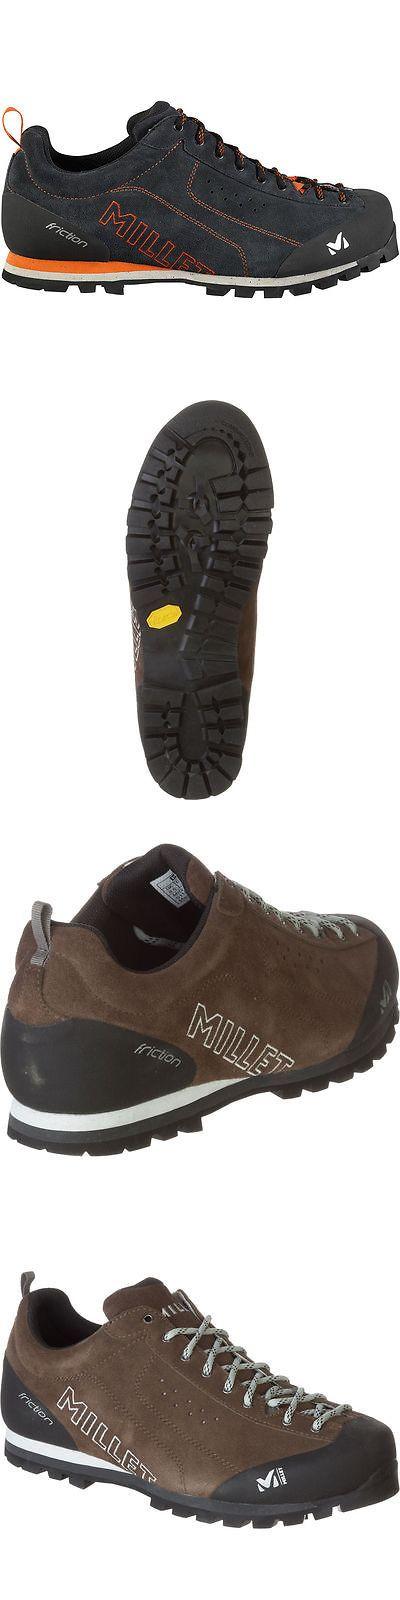 Men 158978: Millet Friction Approach Shoe - Men S -> BUY IT NOW ONLY: $159.95 on eBay!